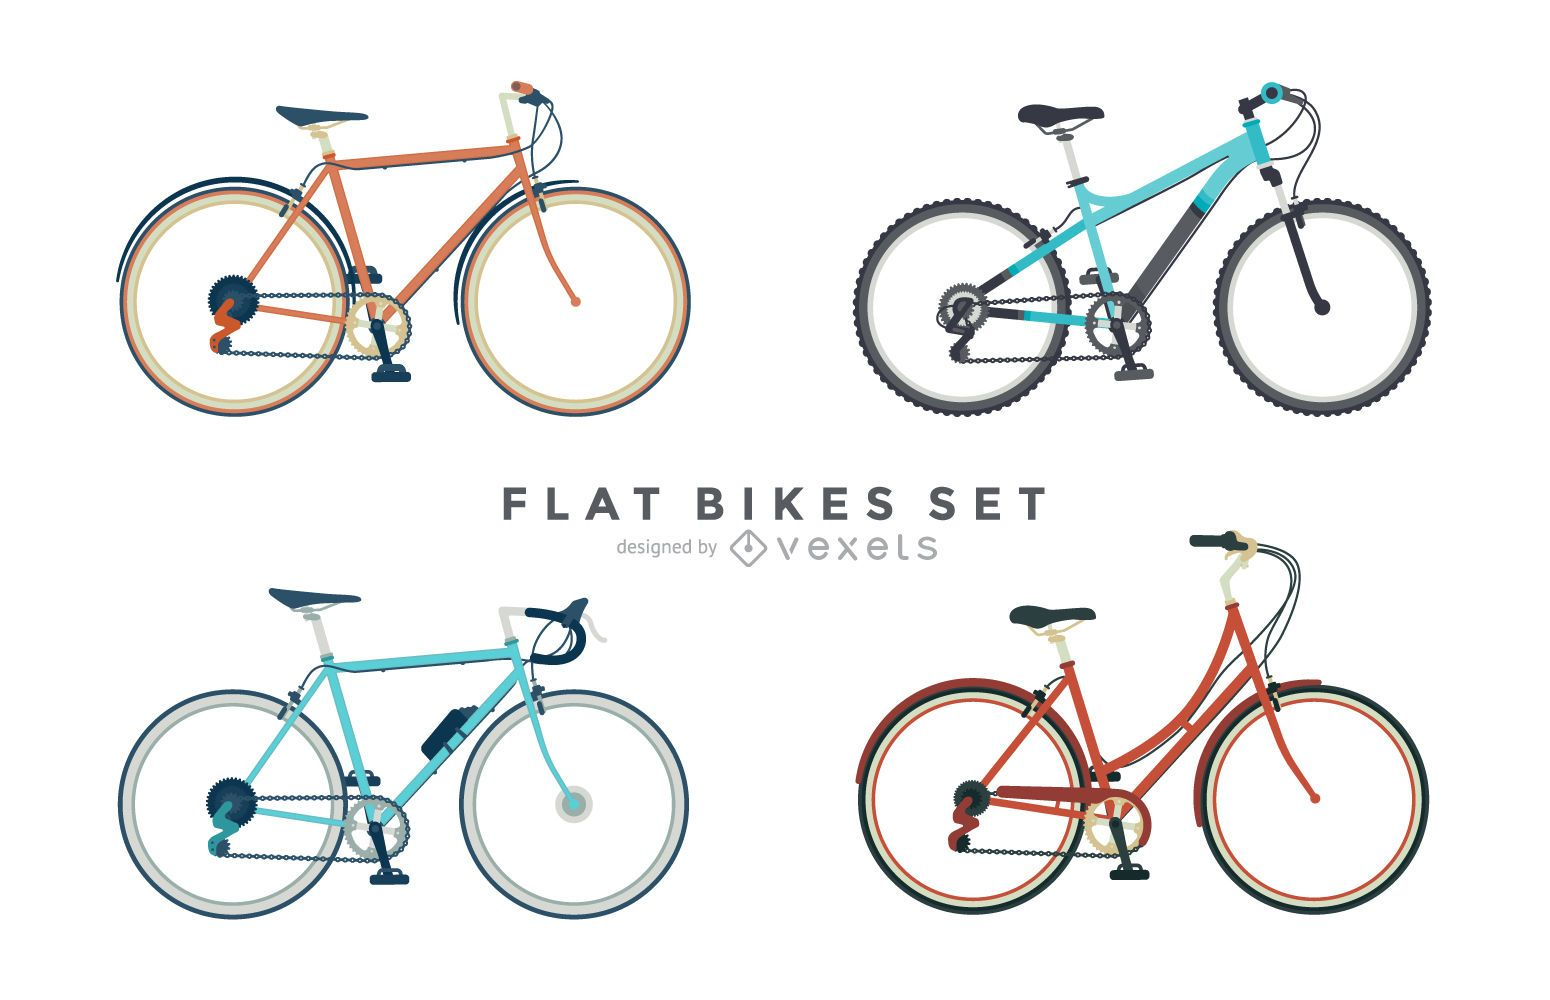 Set of 4 flat bicycle illustrations